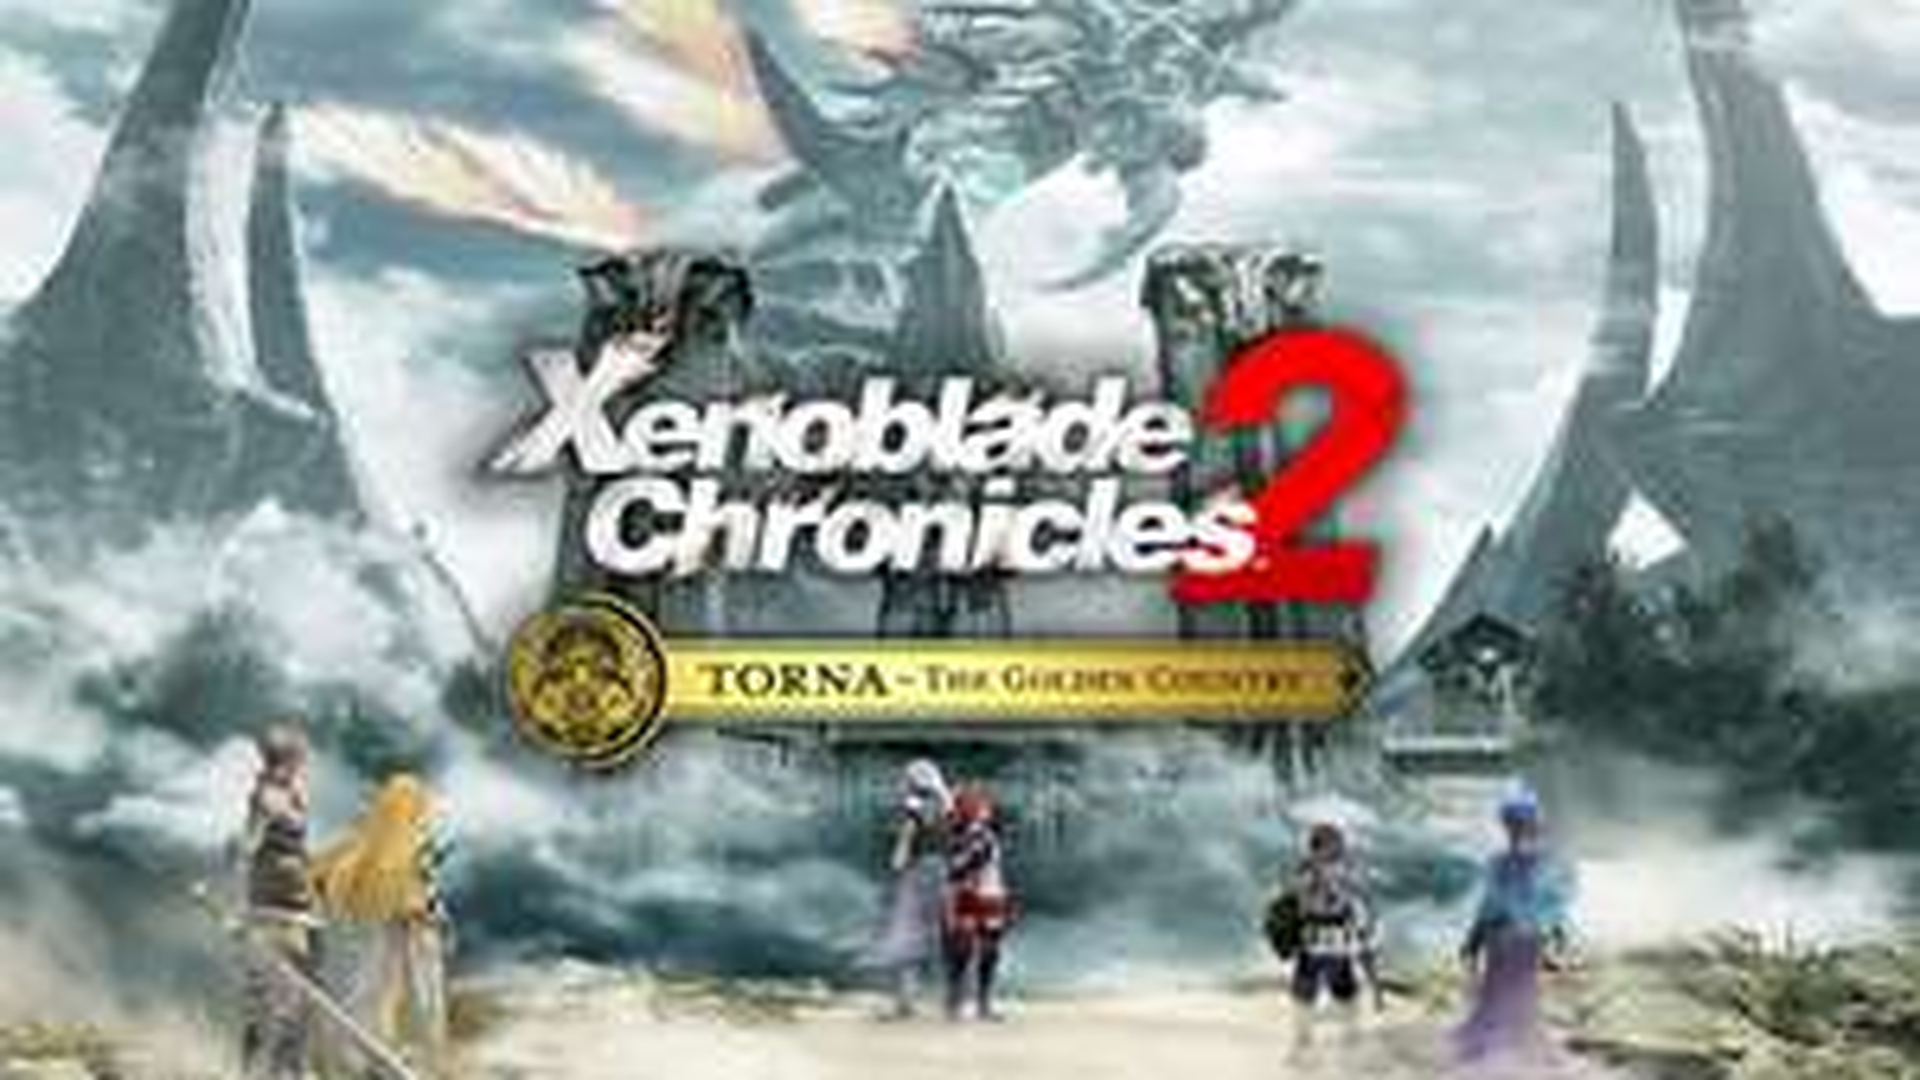 Xenoblade Chronicles 2: Torna (Nintendo Switch) £27.99 @ Argos